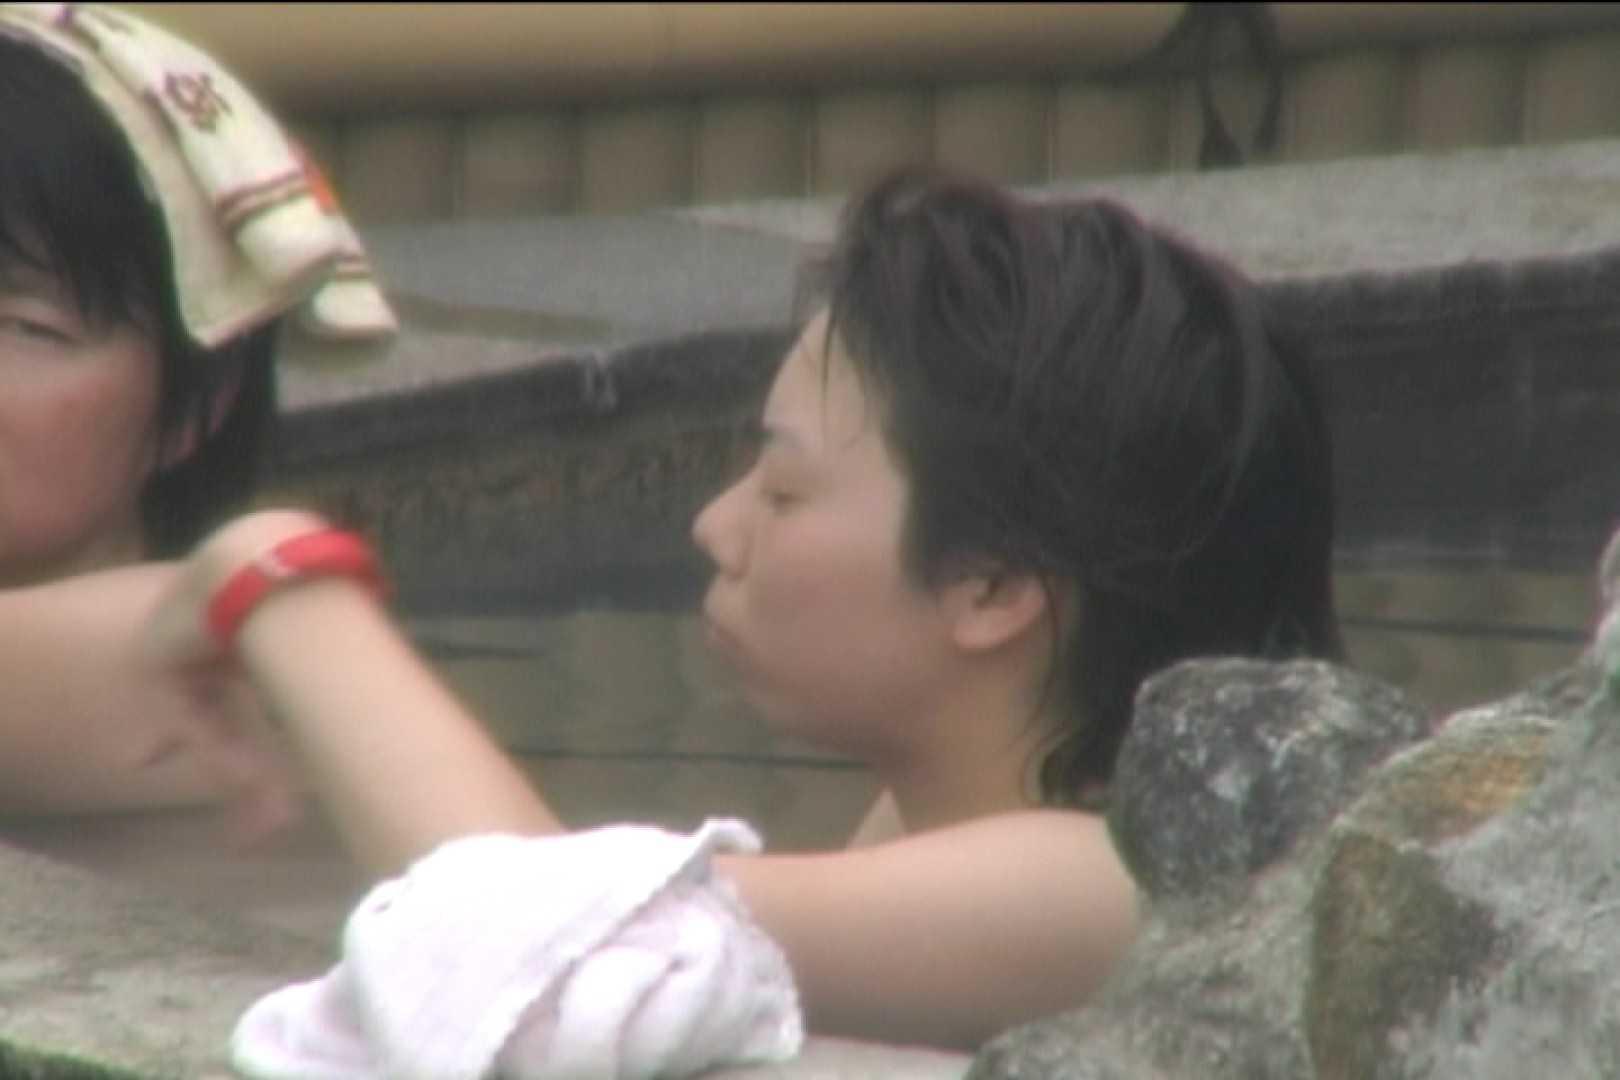 Aquaな露天風呂Vol.122 露天 おめこ無修正動画無料 107pic 99